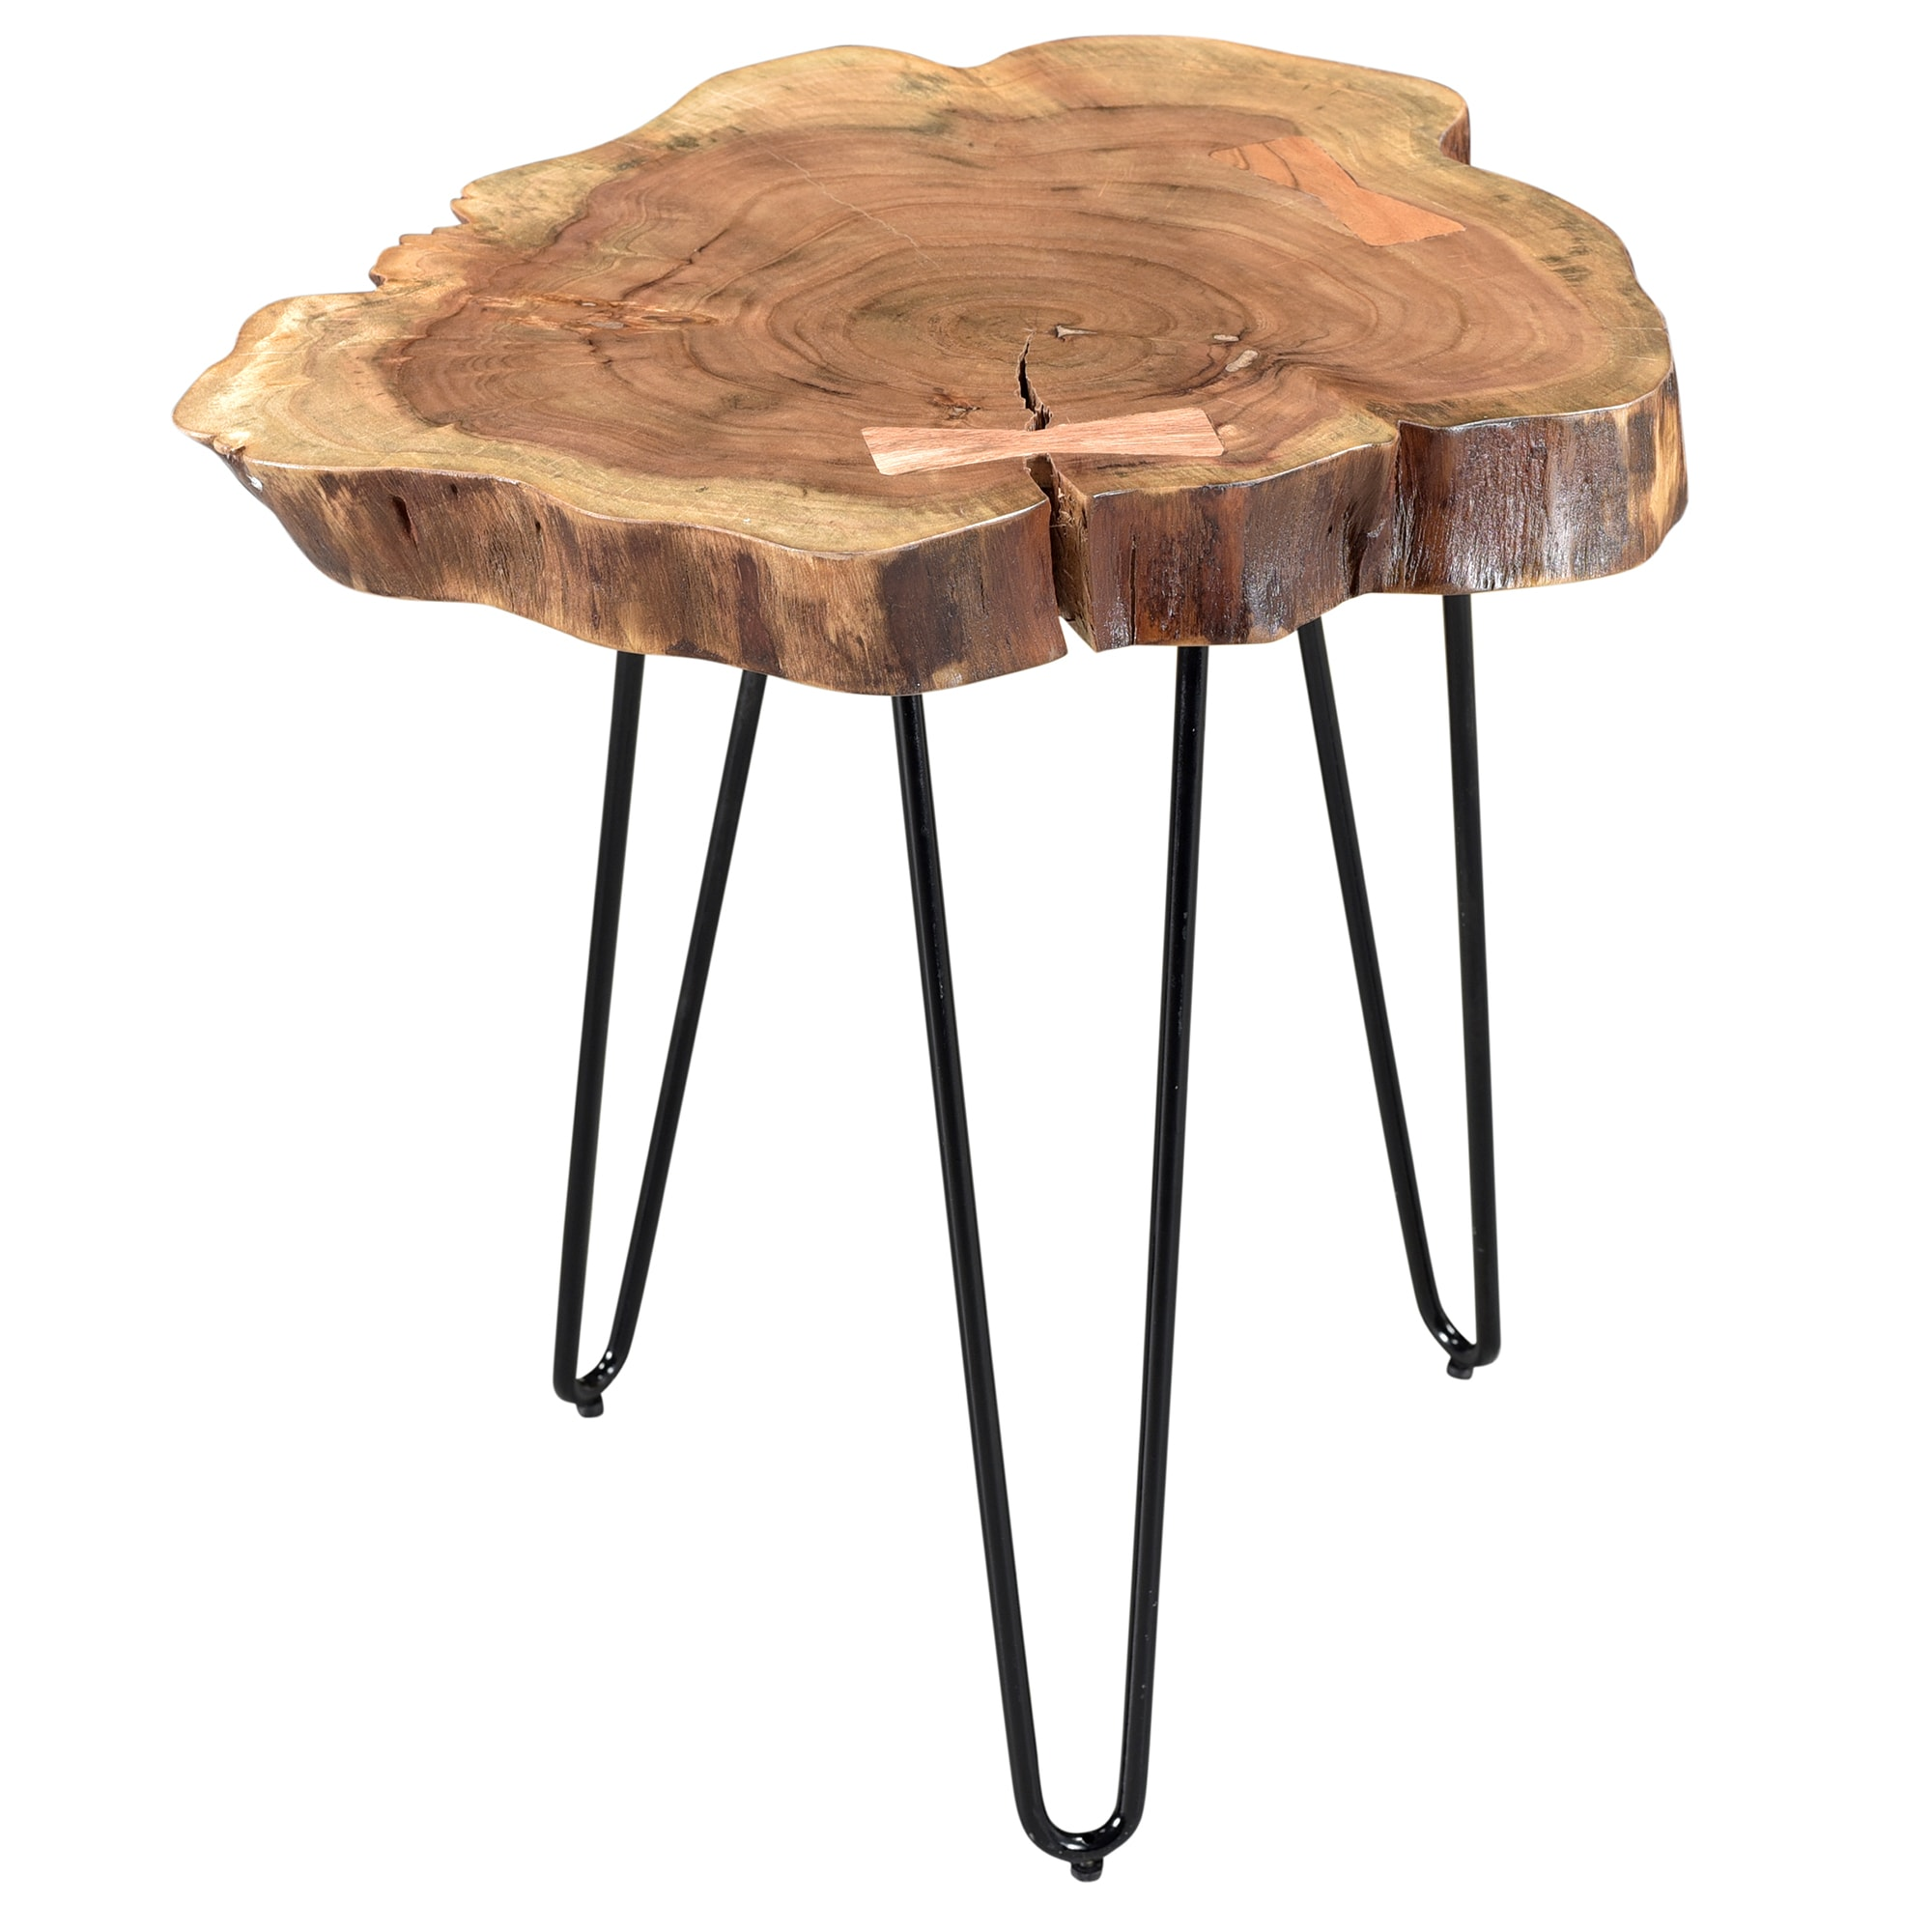 - Shop Nila Acacia Wood/Wrought Iron Accent Table - On Sale